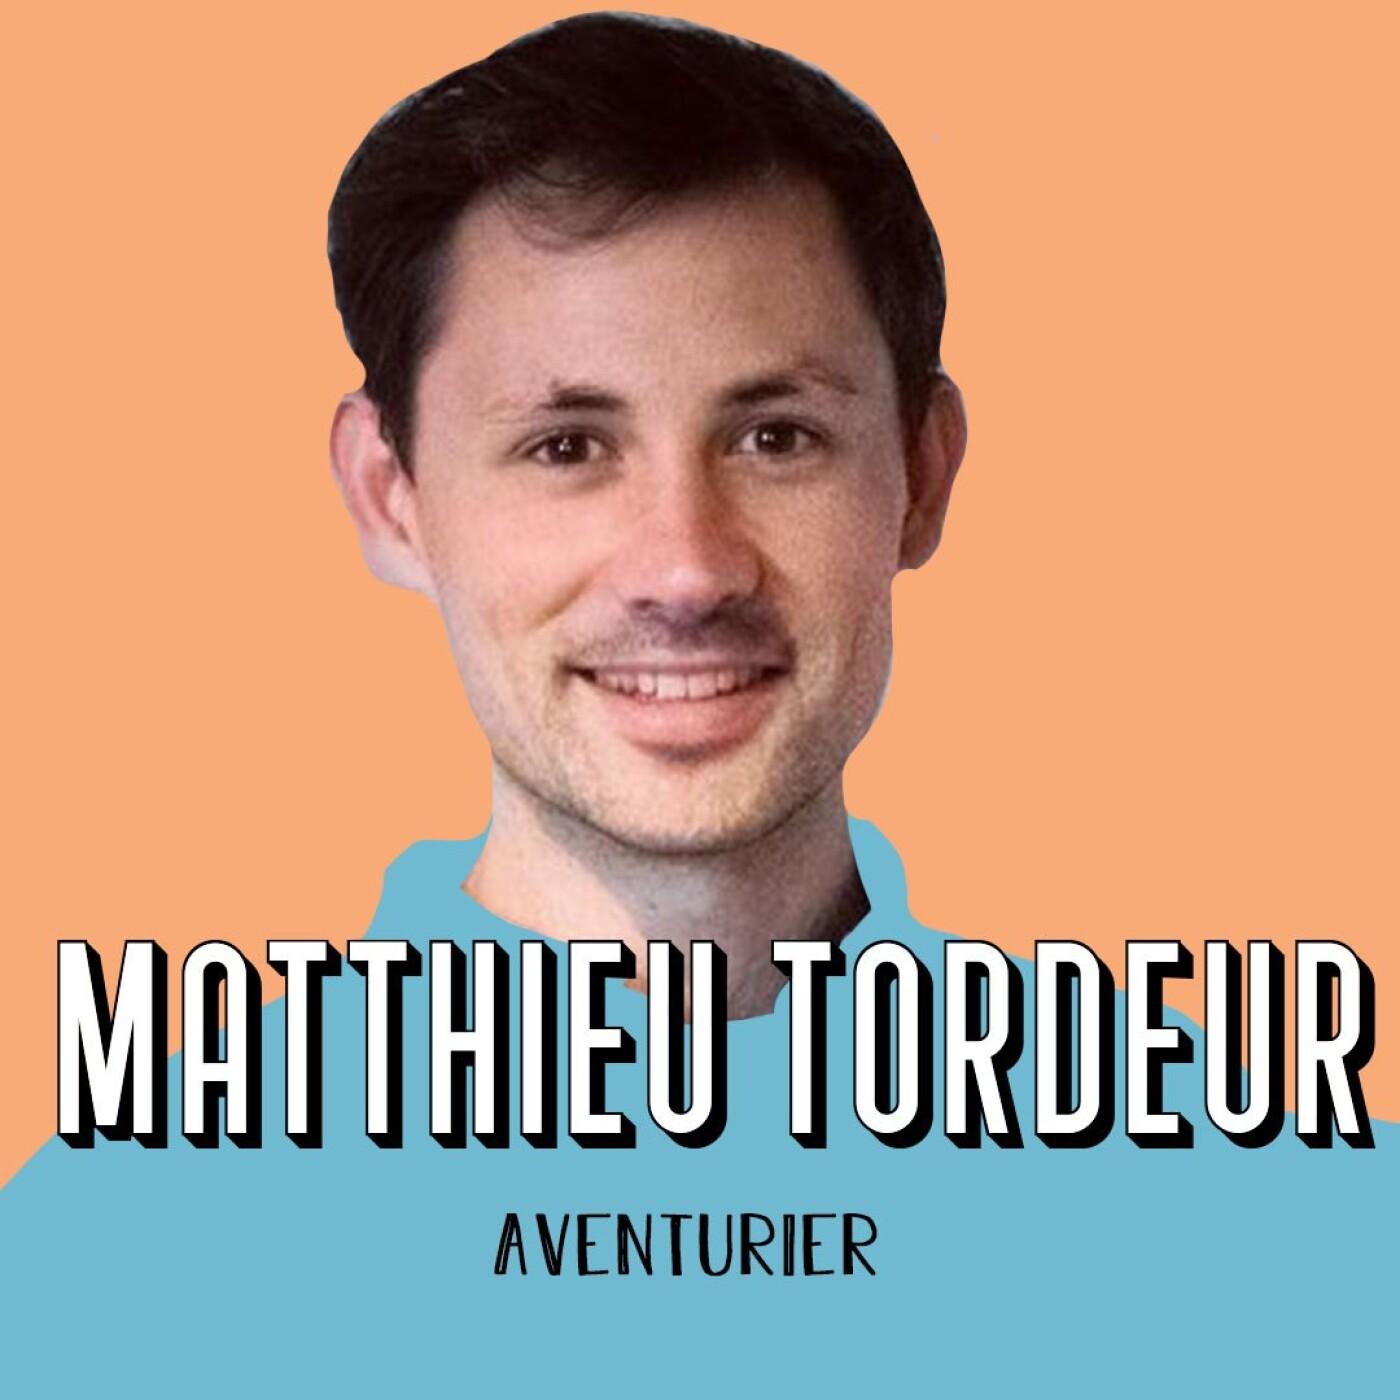 Matthieu Tordeur, Aventurier - Rêver grand mais commencer petit